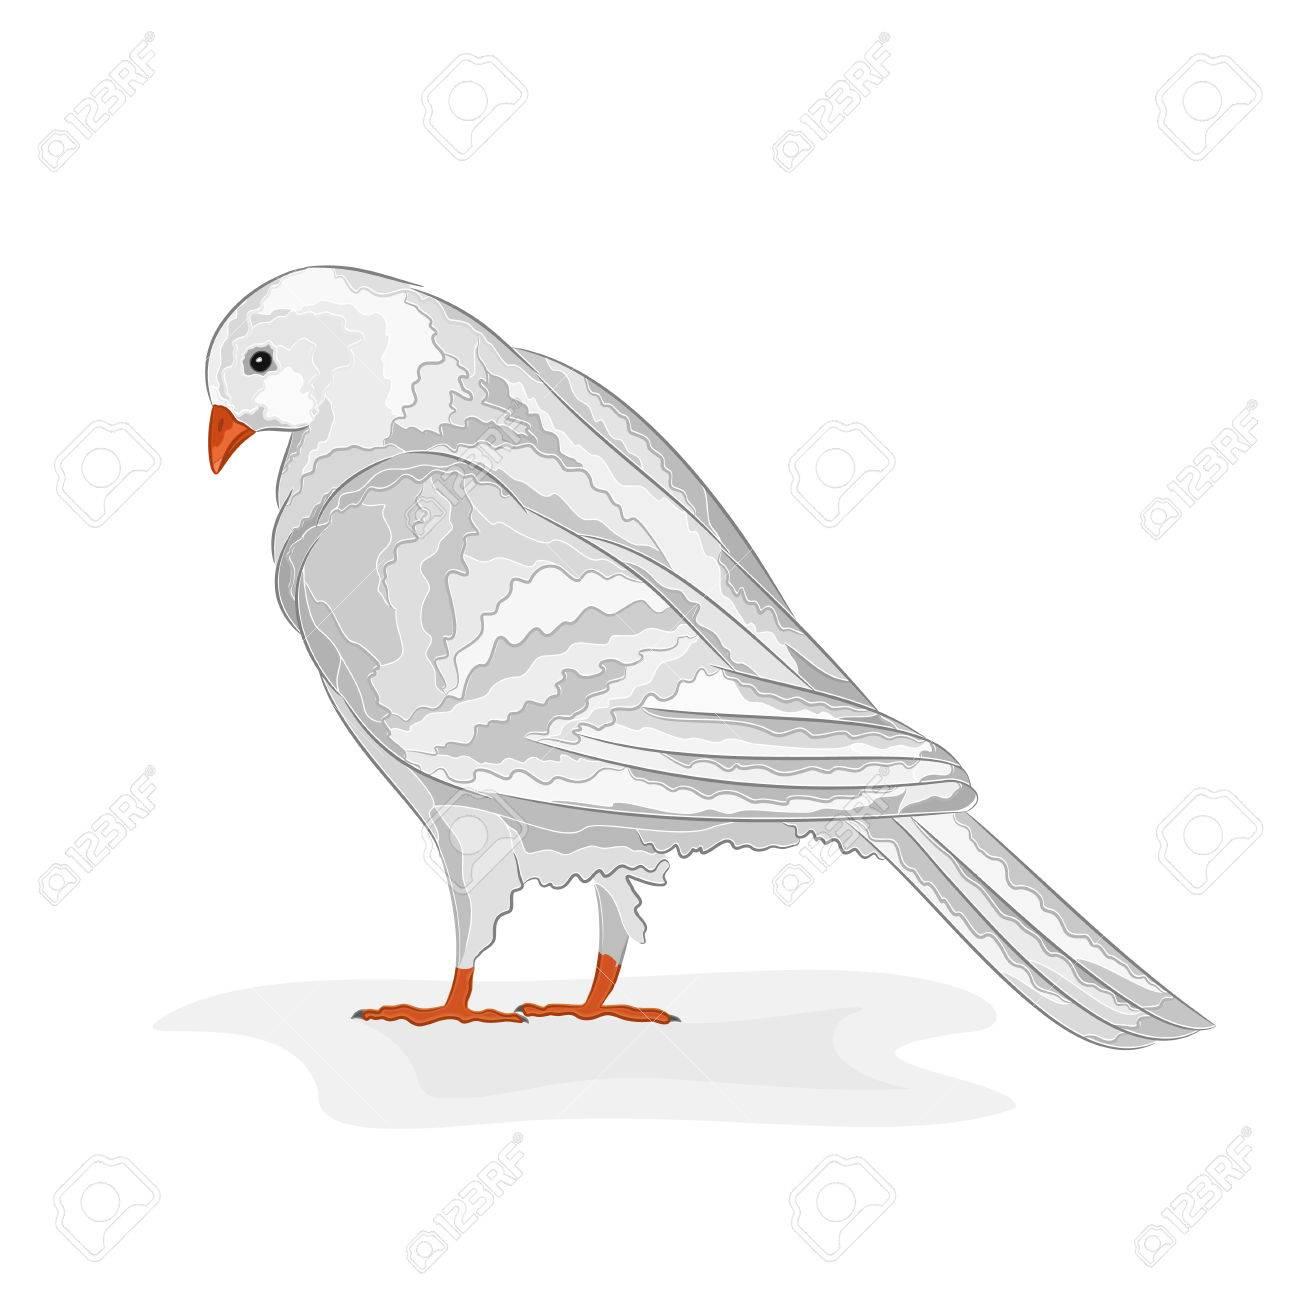 38966799-white-pigeon-white-dove-symbol-peace-vector-illustration